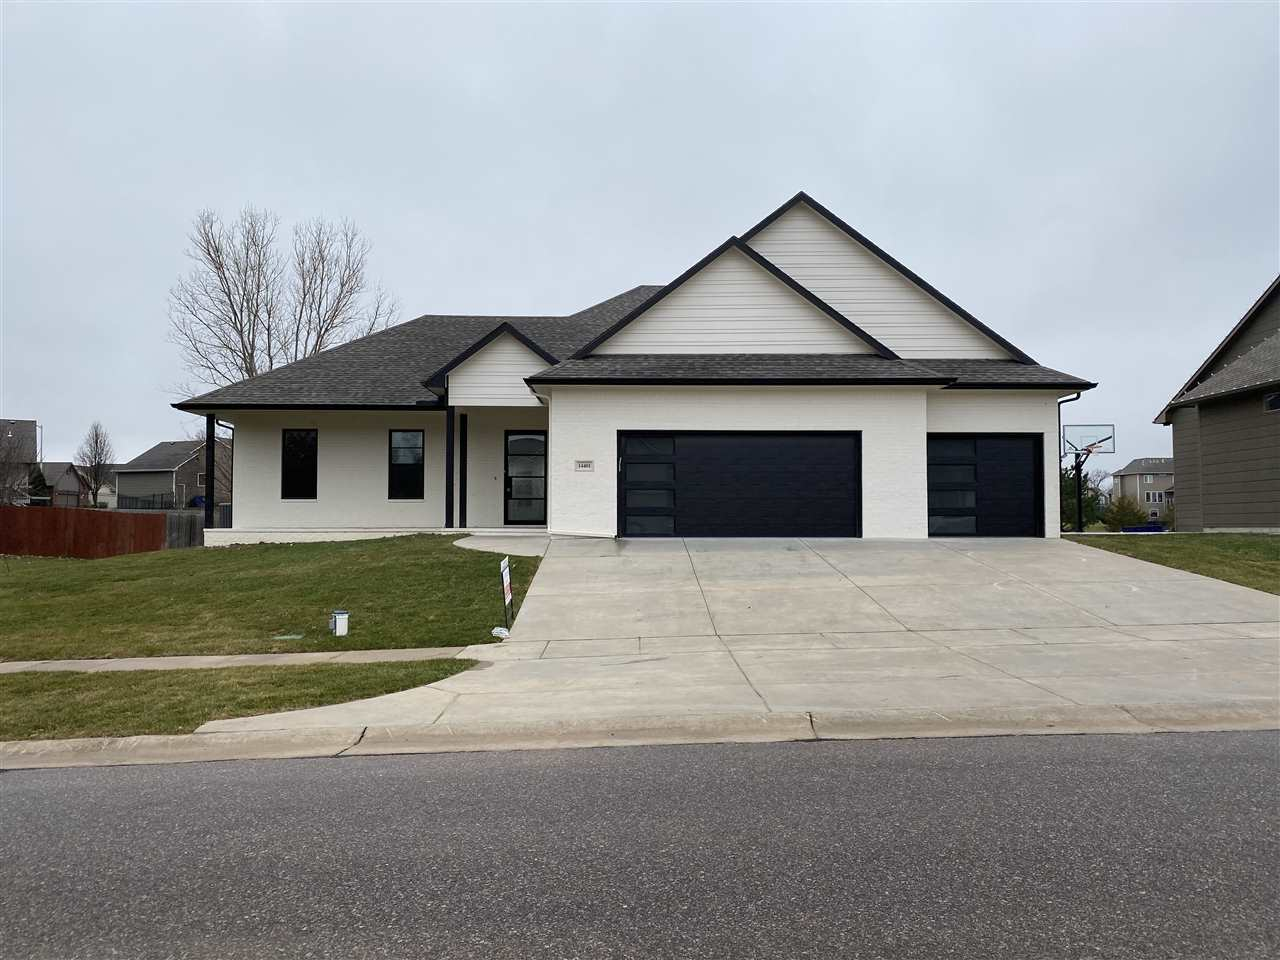 For Sale: 14401 Valley Hi Rd., Wichita, KS, 67235,